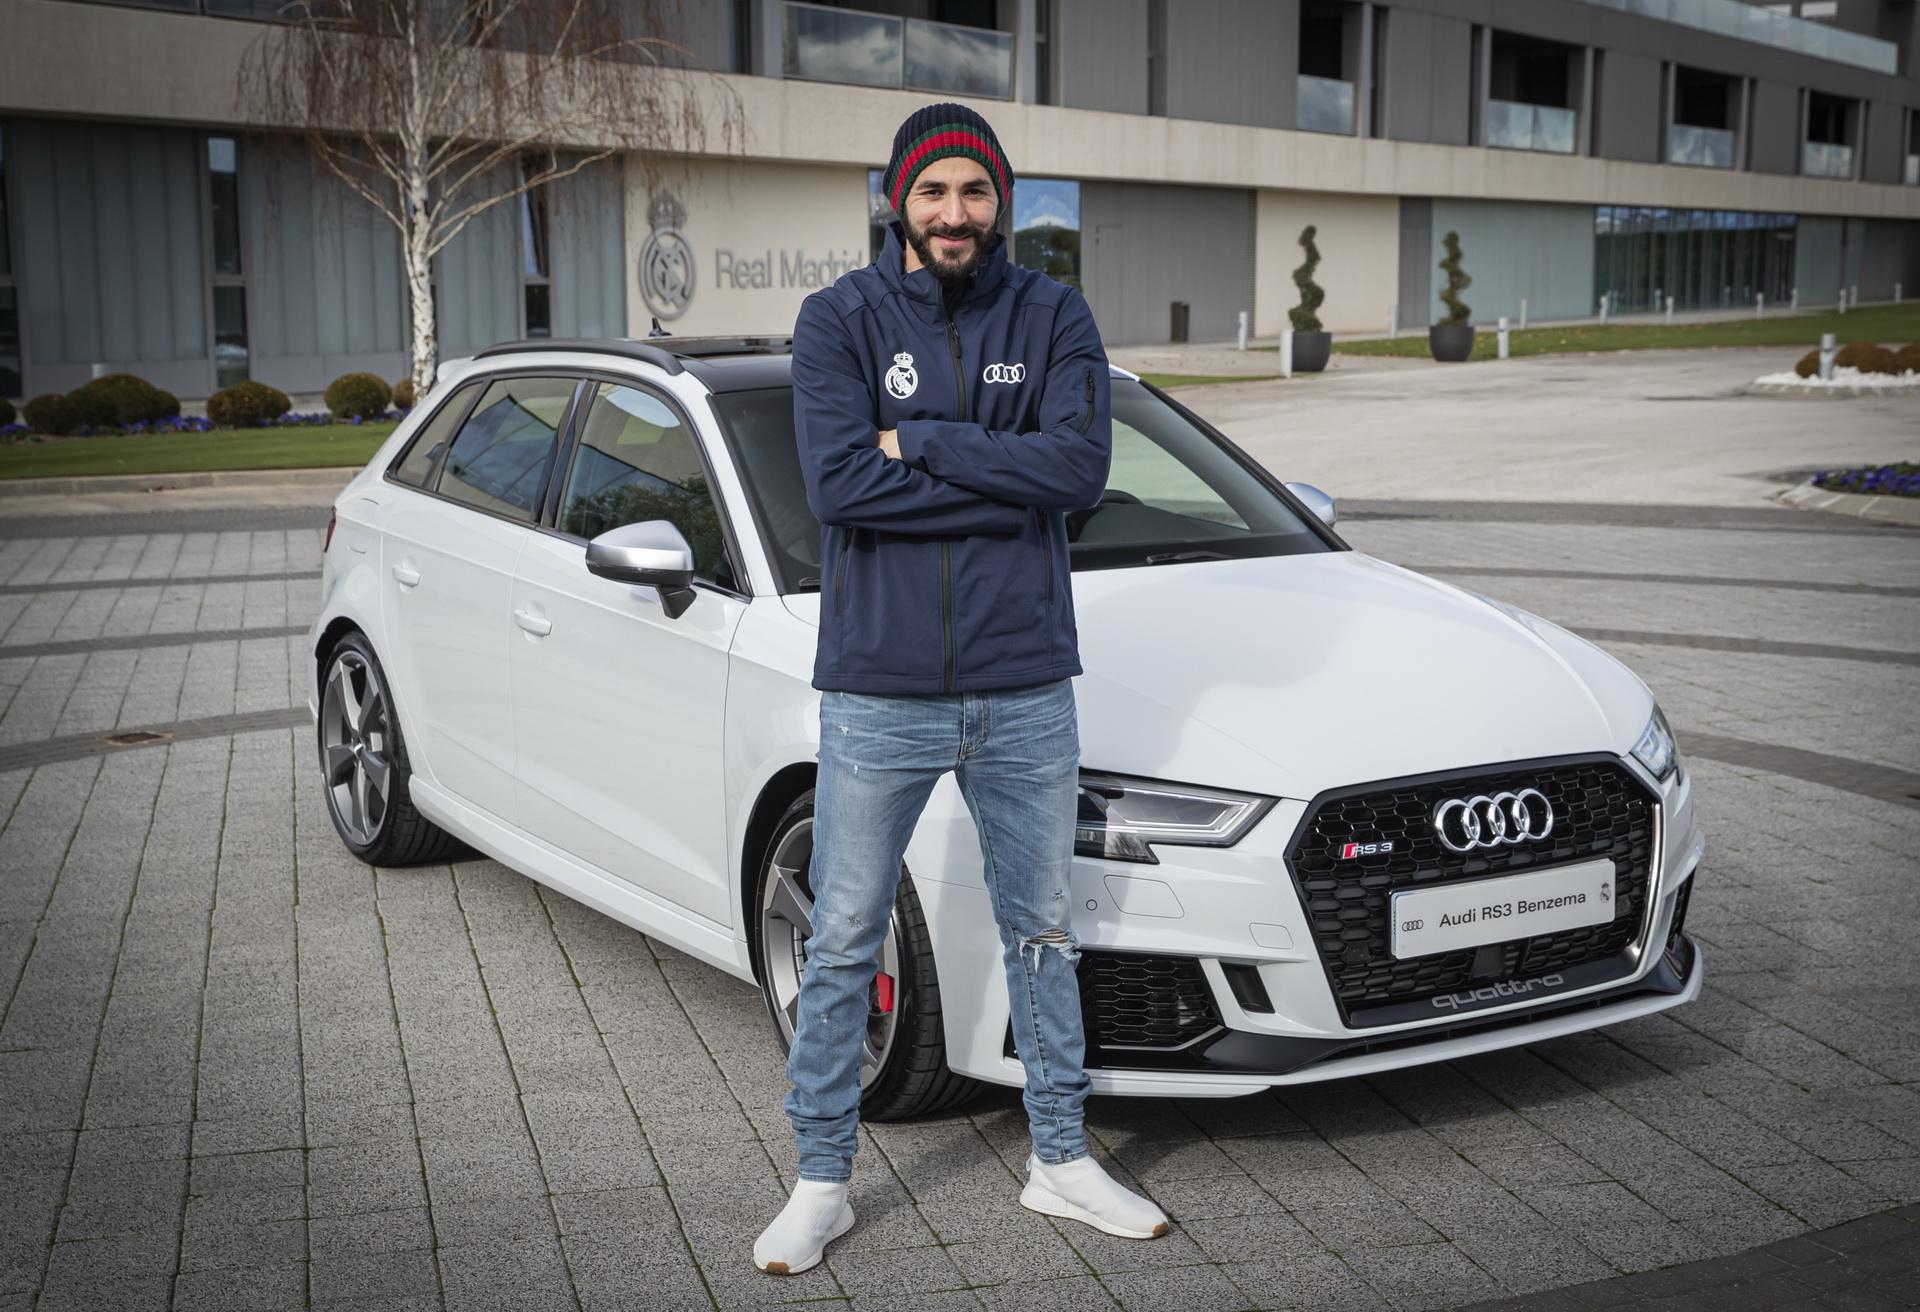 Real_Madrid_Players_Audi_0008